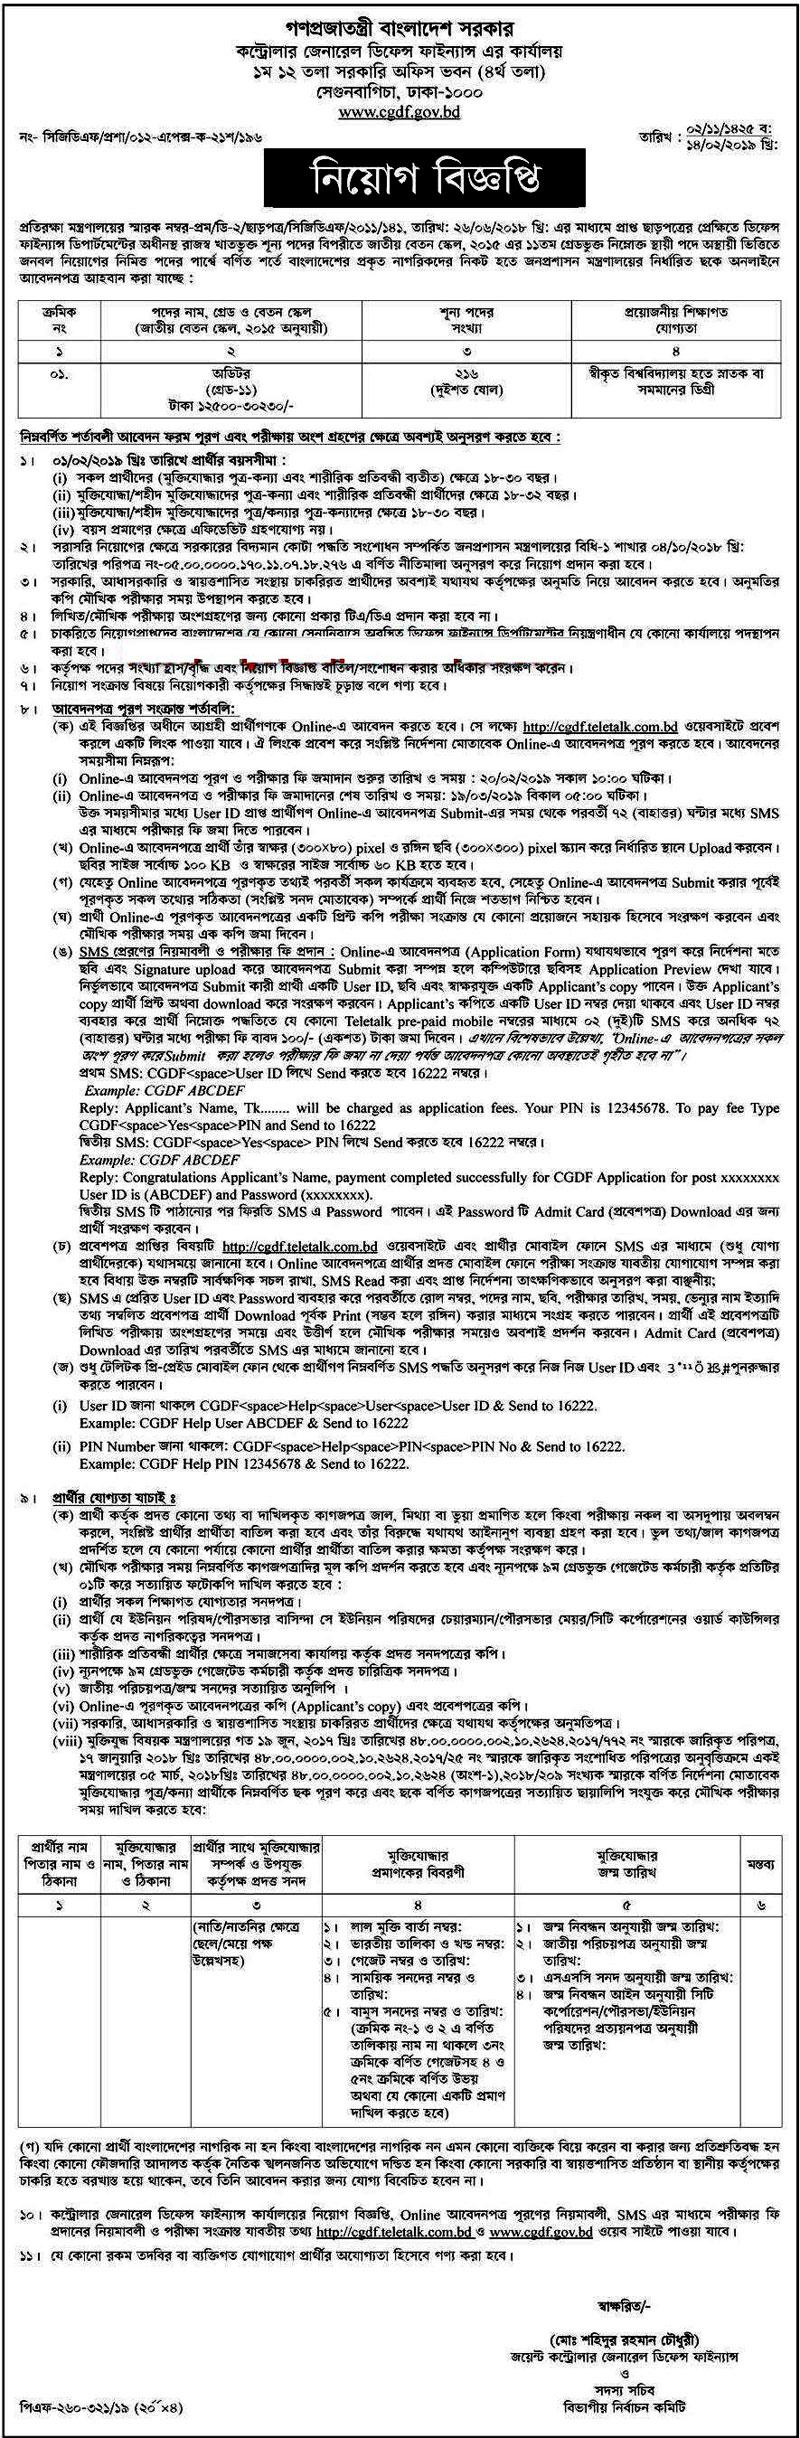 Bangladesh Auditor General Job Circular 2019